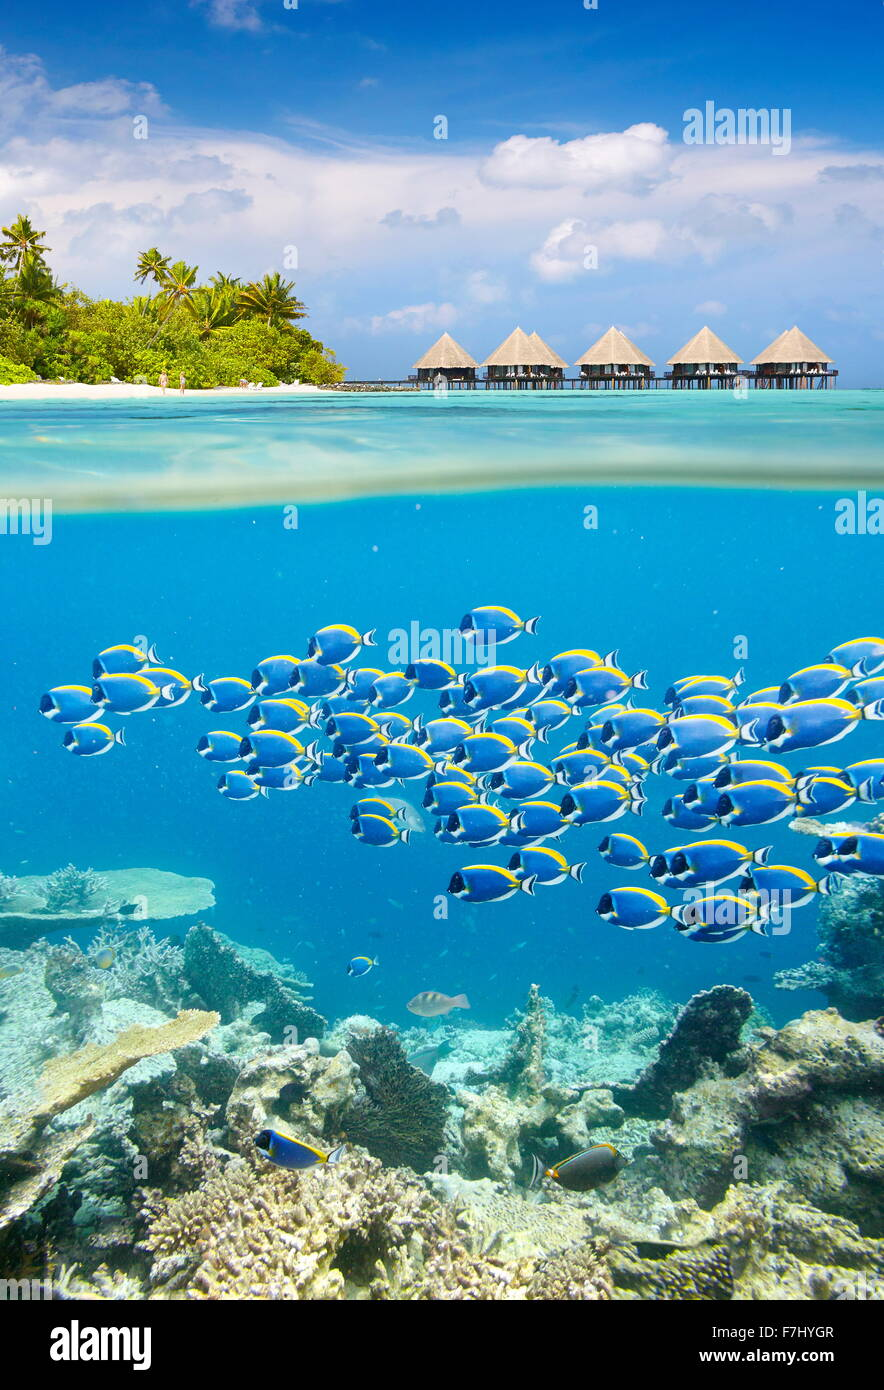 Maldivas - Isla tropical con vista submarina cardumen de peces Foto de stock